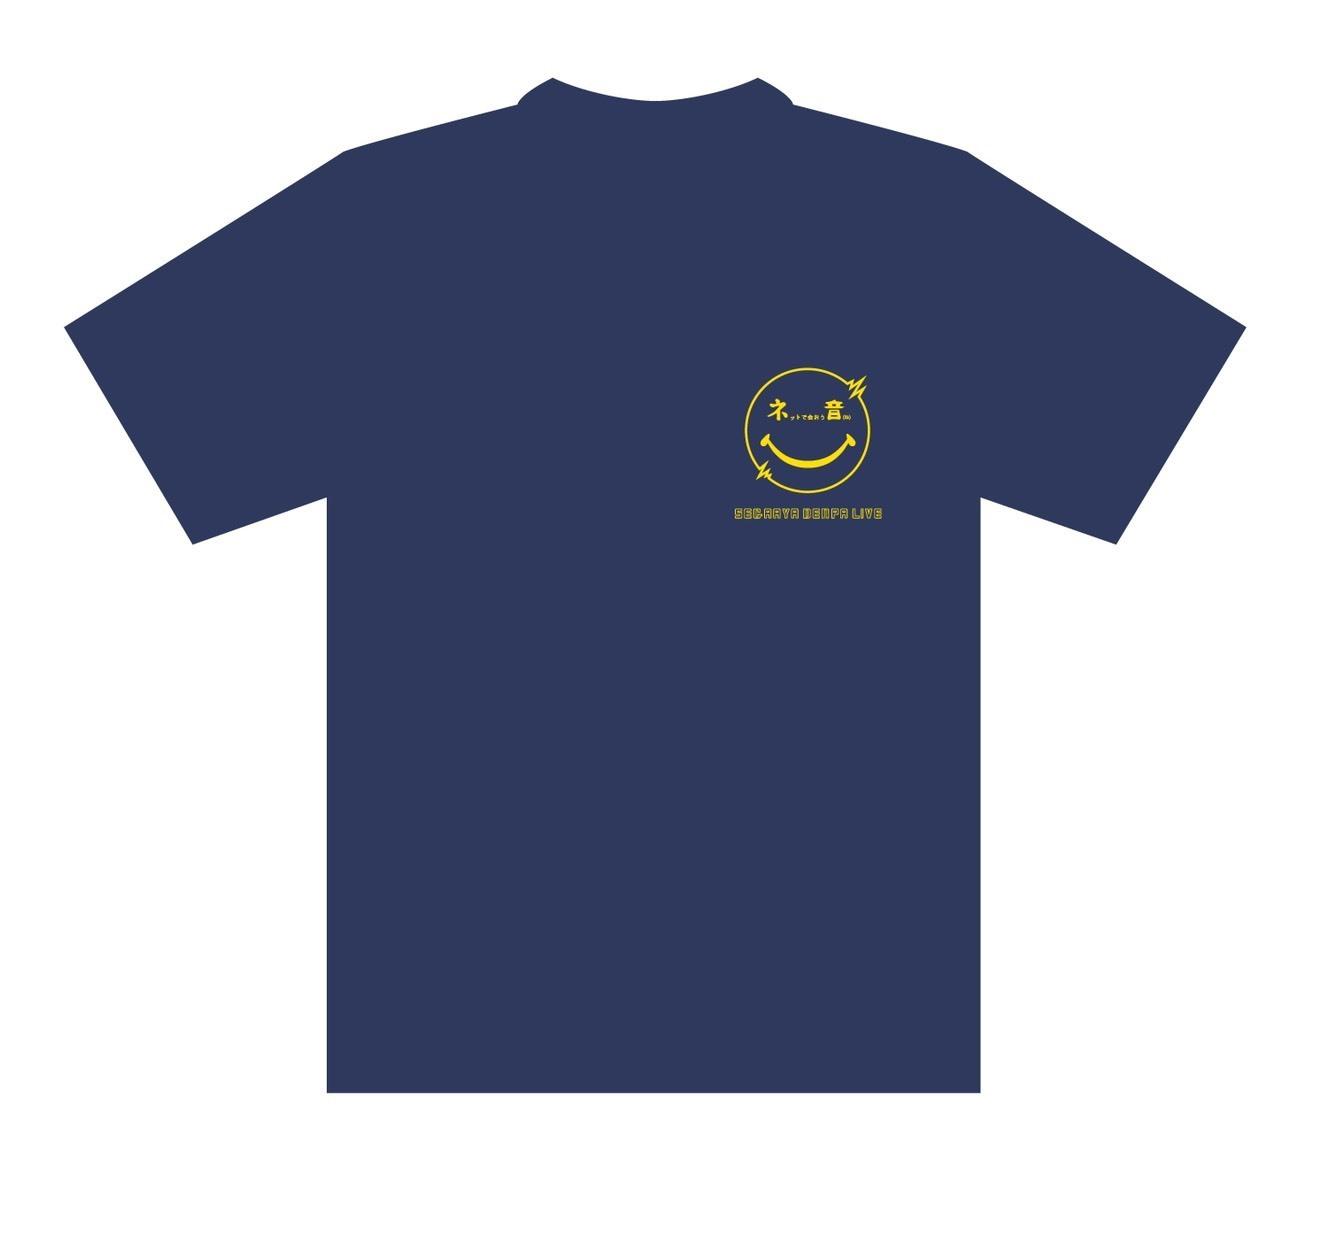 【SEGAAYA DENPA LIVE~ネットで会おう音(ね)~】Tシャツ ネイビー